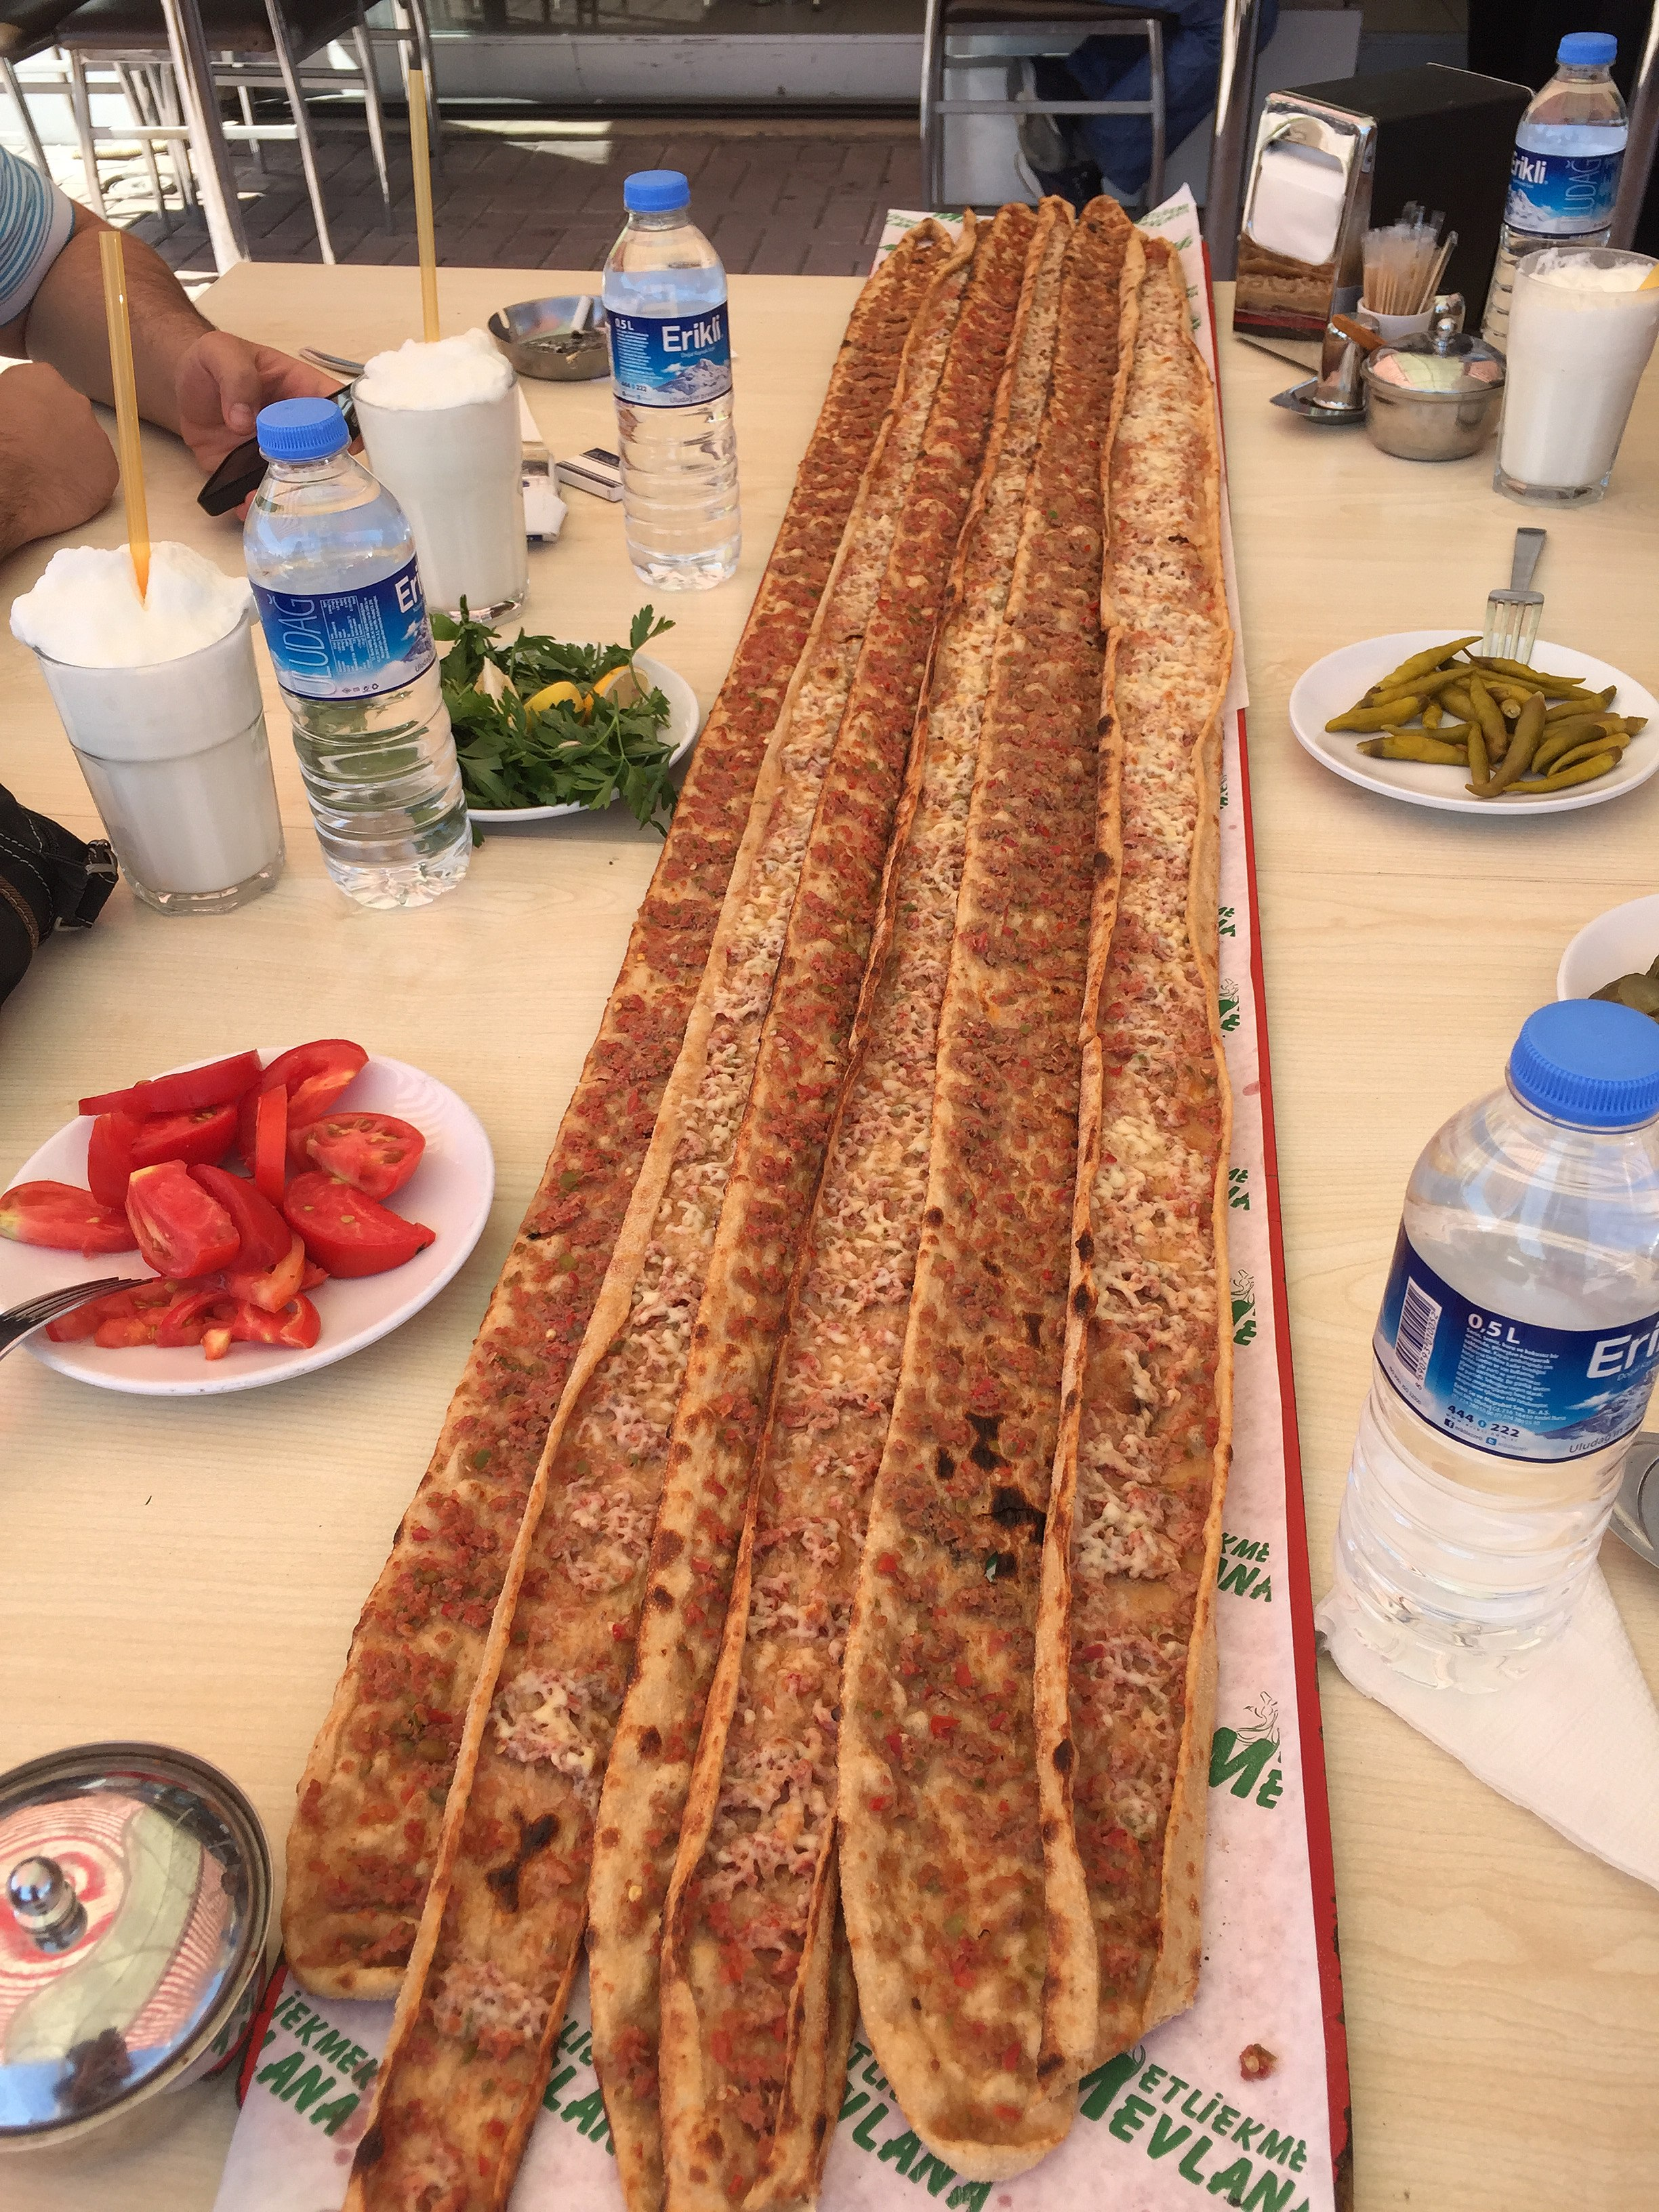 FileEtli ekmek in Konya turkey By Mardetanha 20.JPG   Wikimedia ...